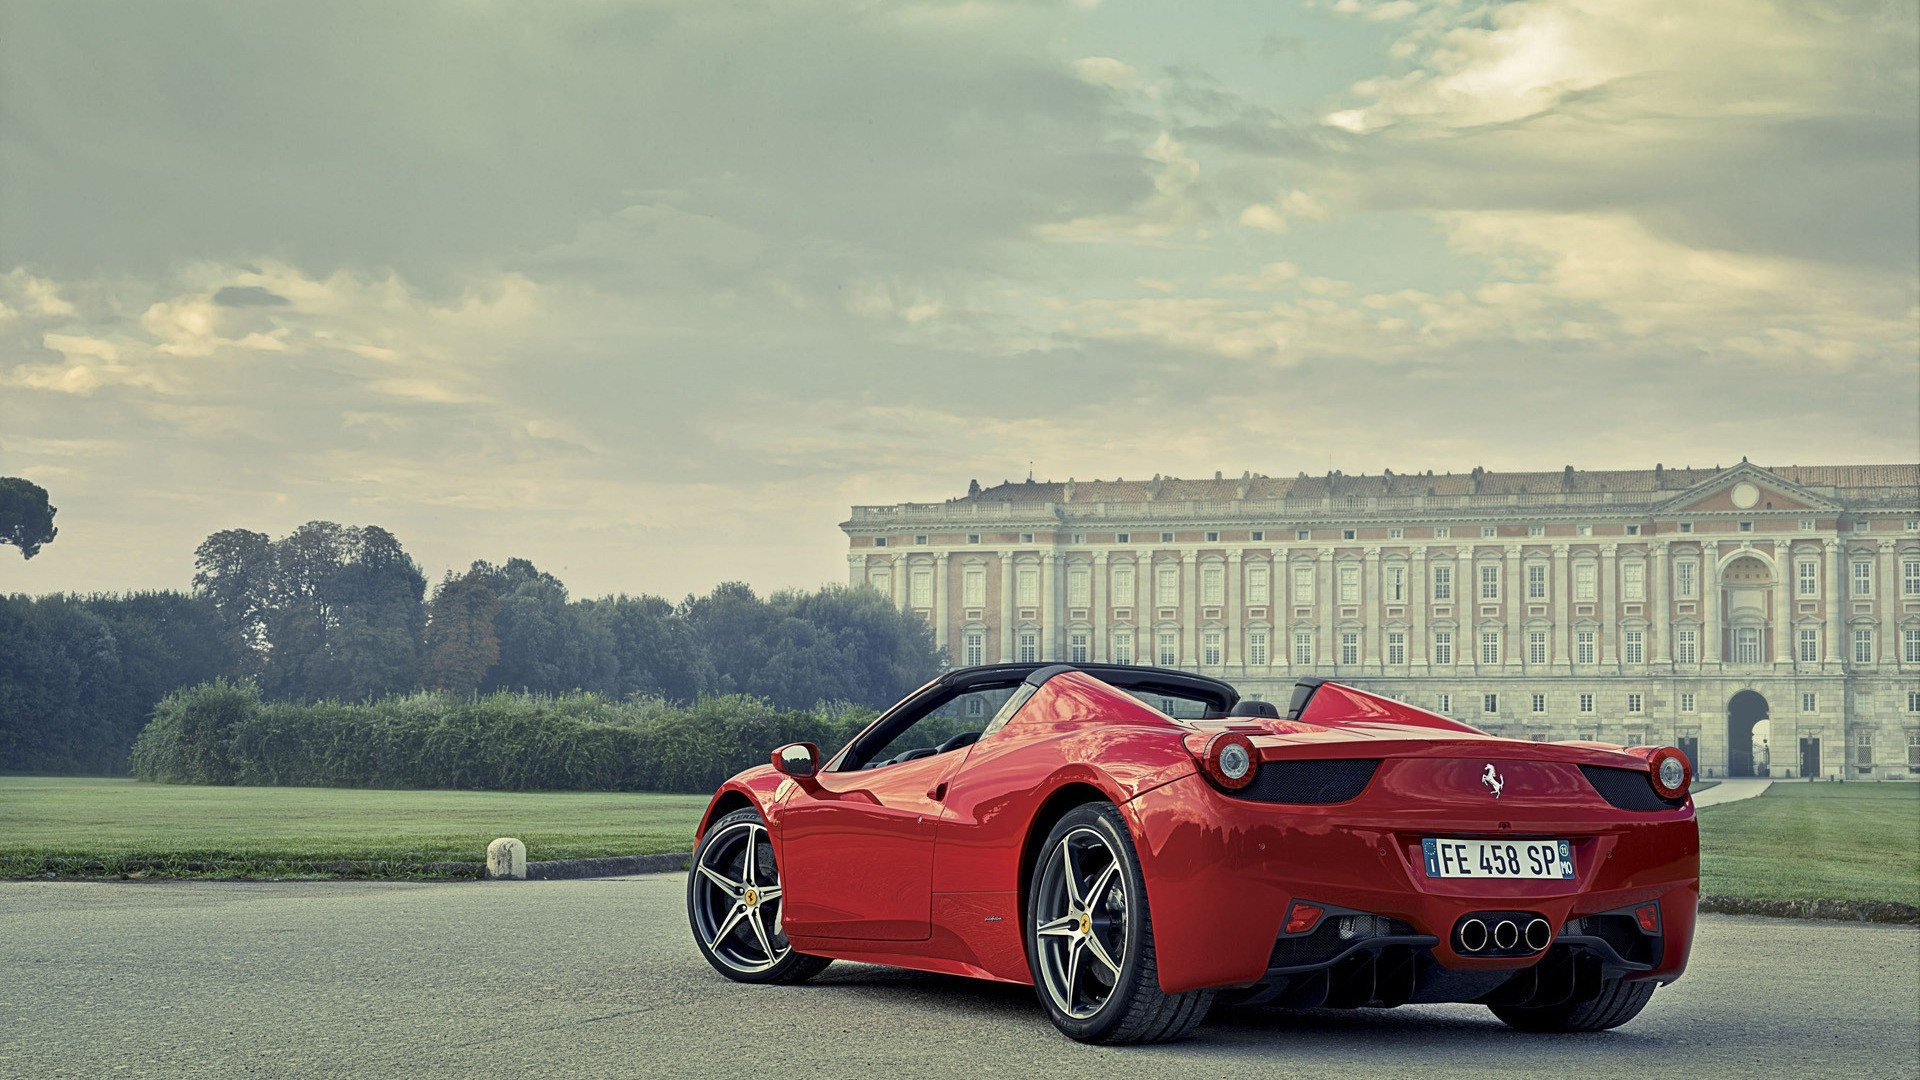 Ferrari 458 Italia Red, HD Cars, 4k Wallpapers, Images ...